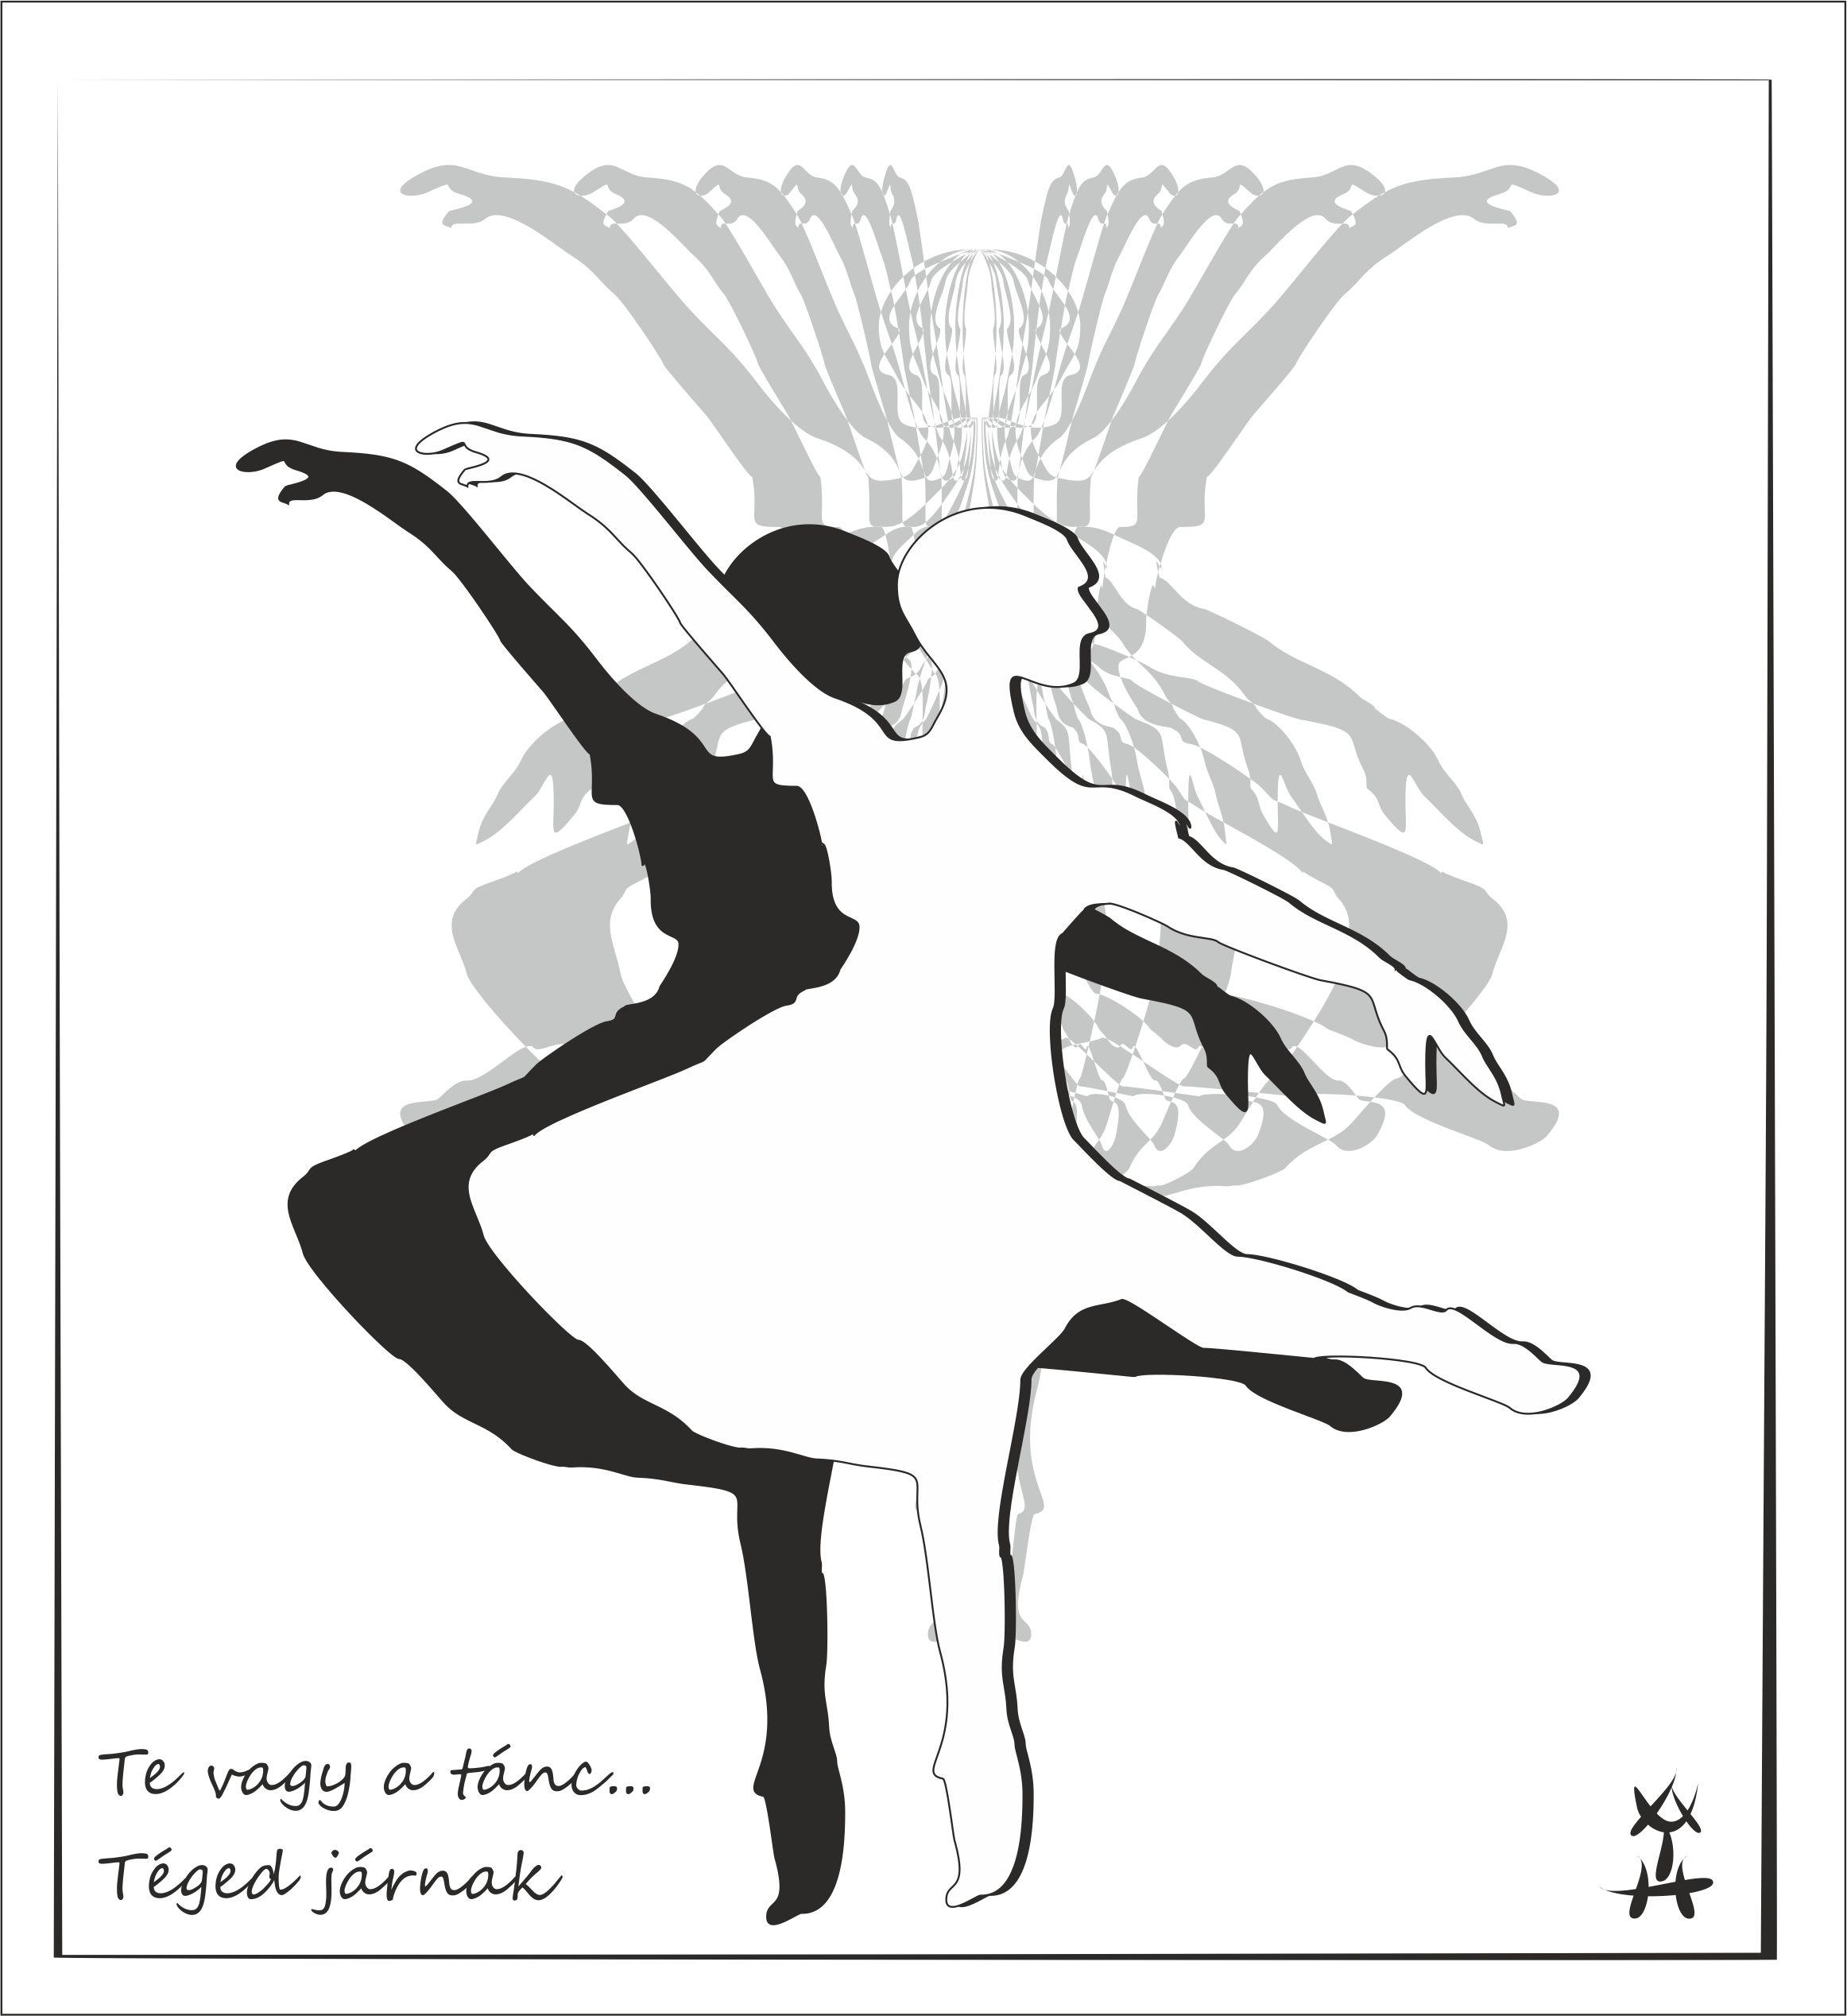 Te vagy a tanc